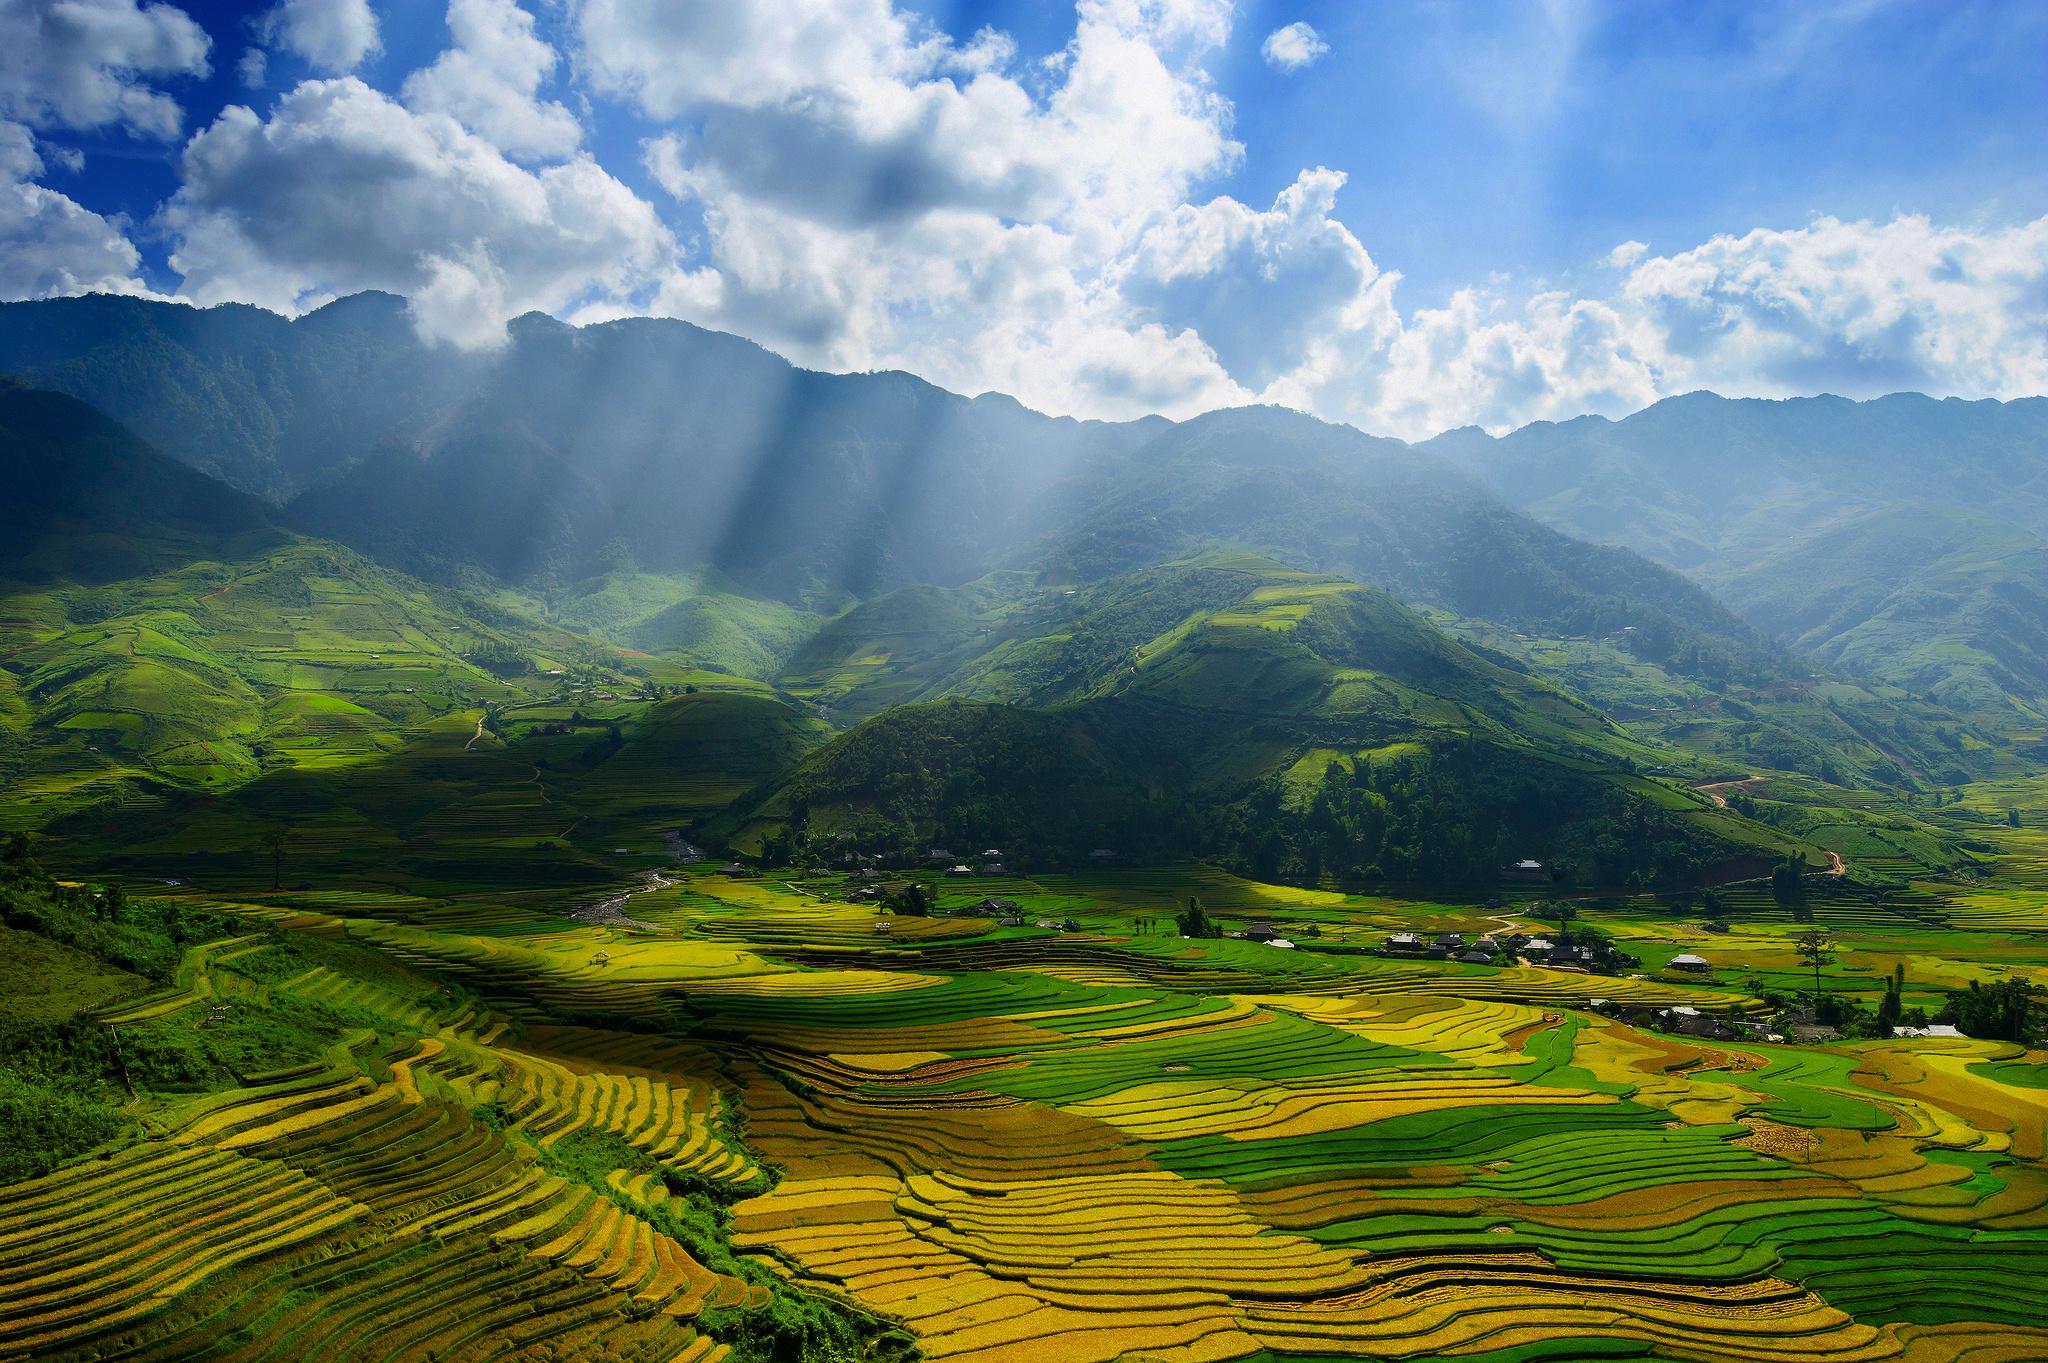 43 Vietnam HD Wallpapers | Backgrounds - Wallpaper Abyss